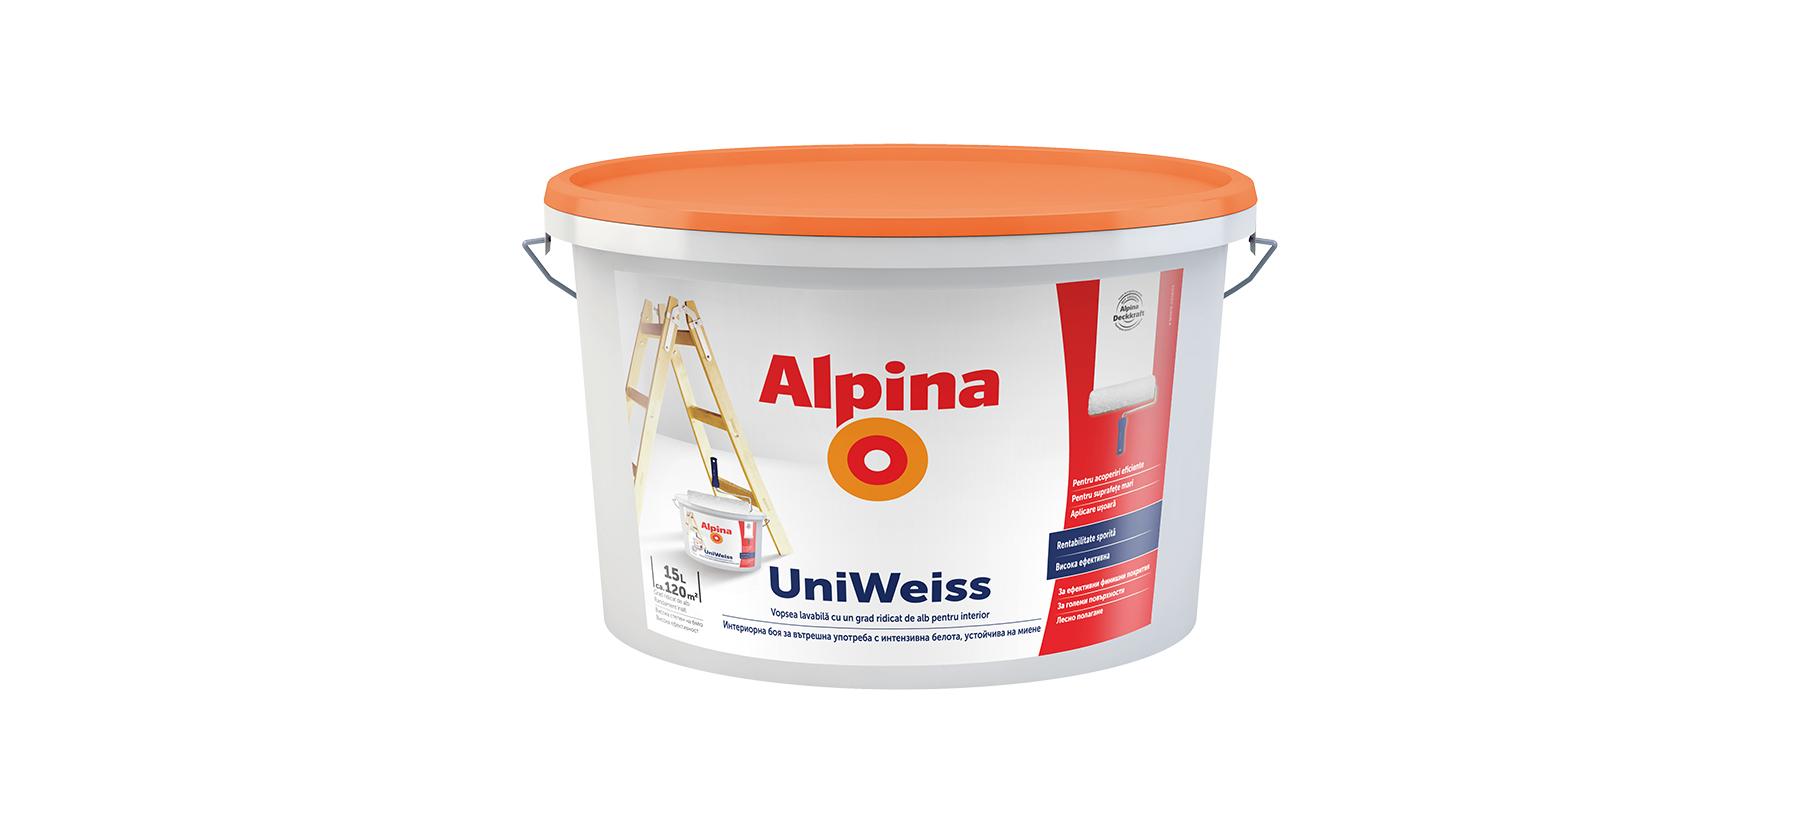 Alpina UniWeiss